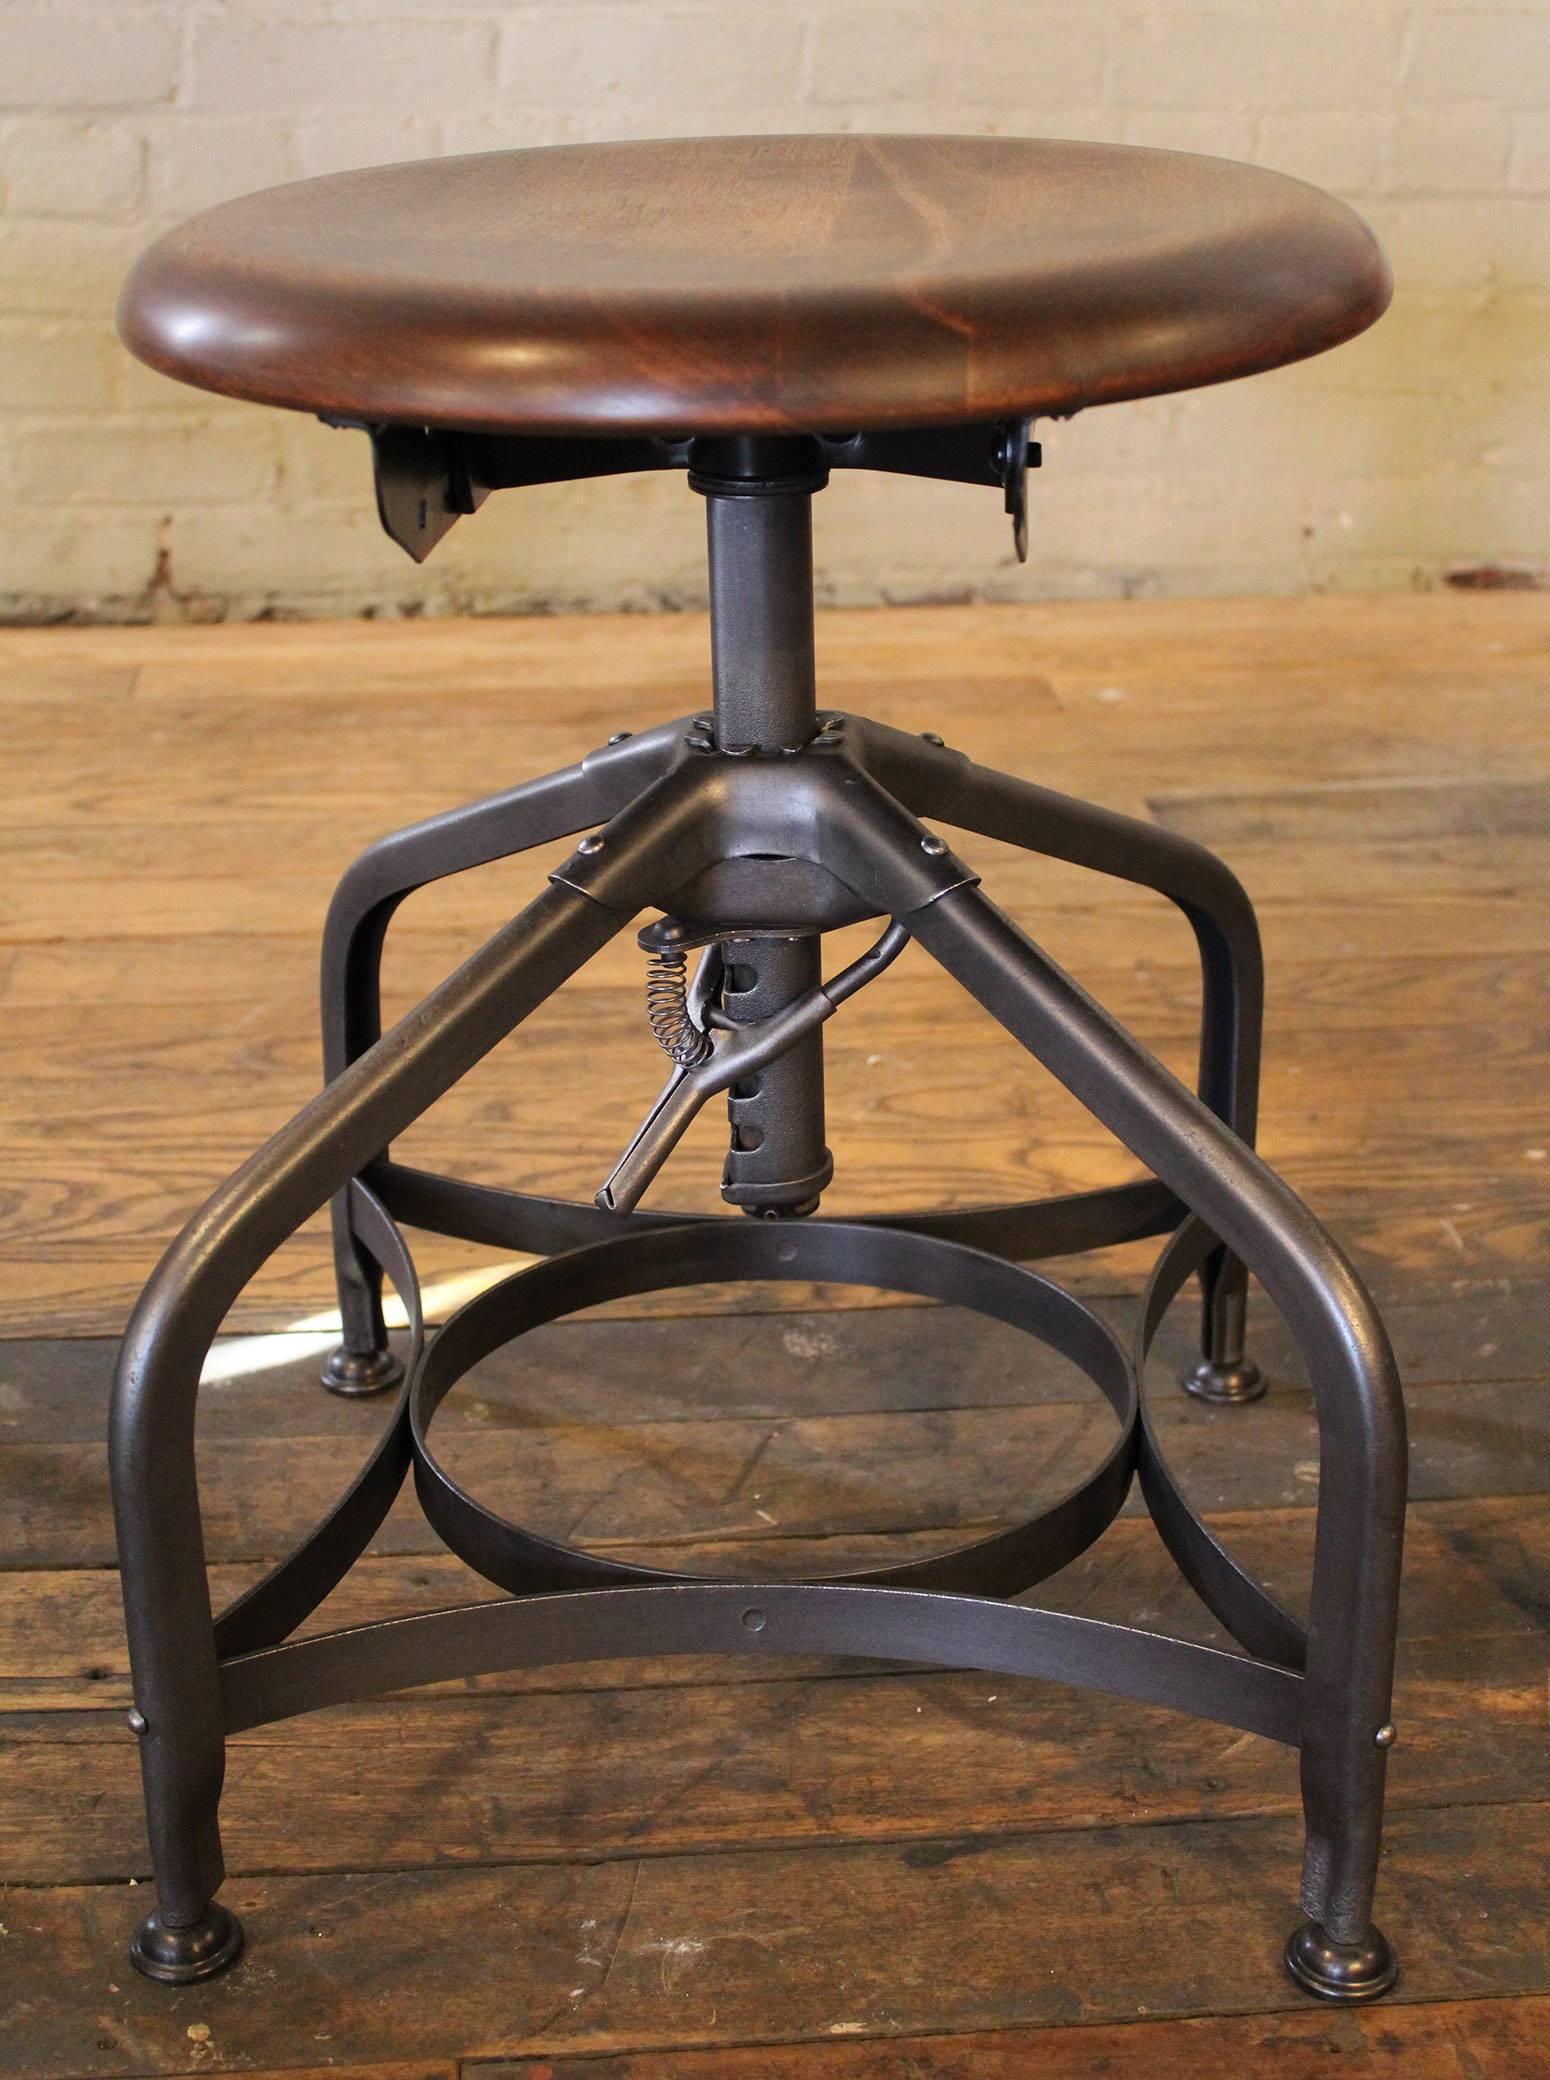 seating furniture getbackinc id at wood stools steampunk industrial master adjustable shop for vintage toledo factory f metal stool sale